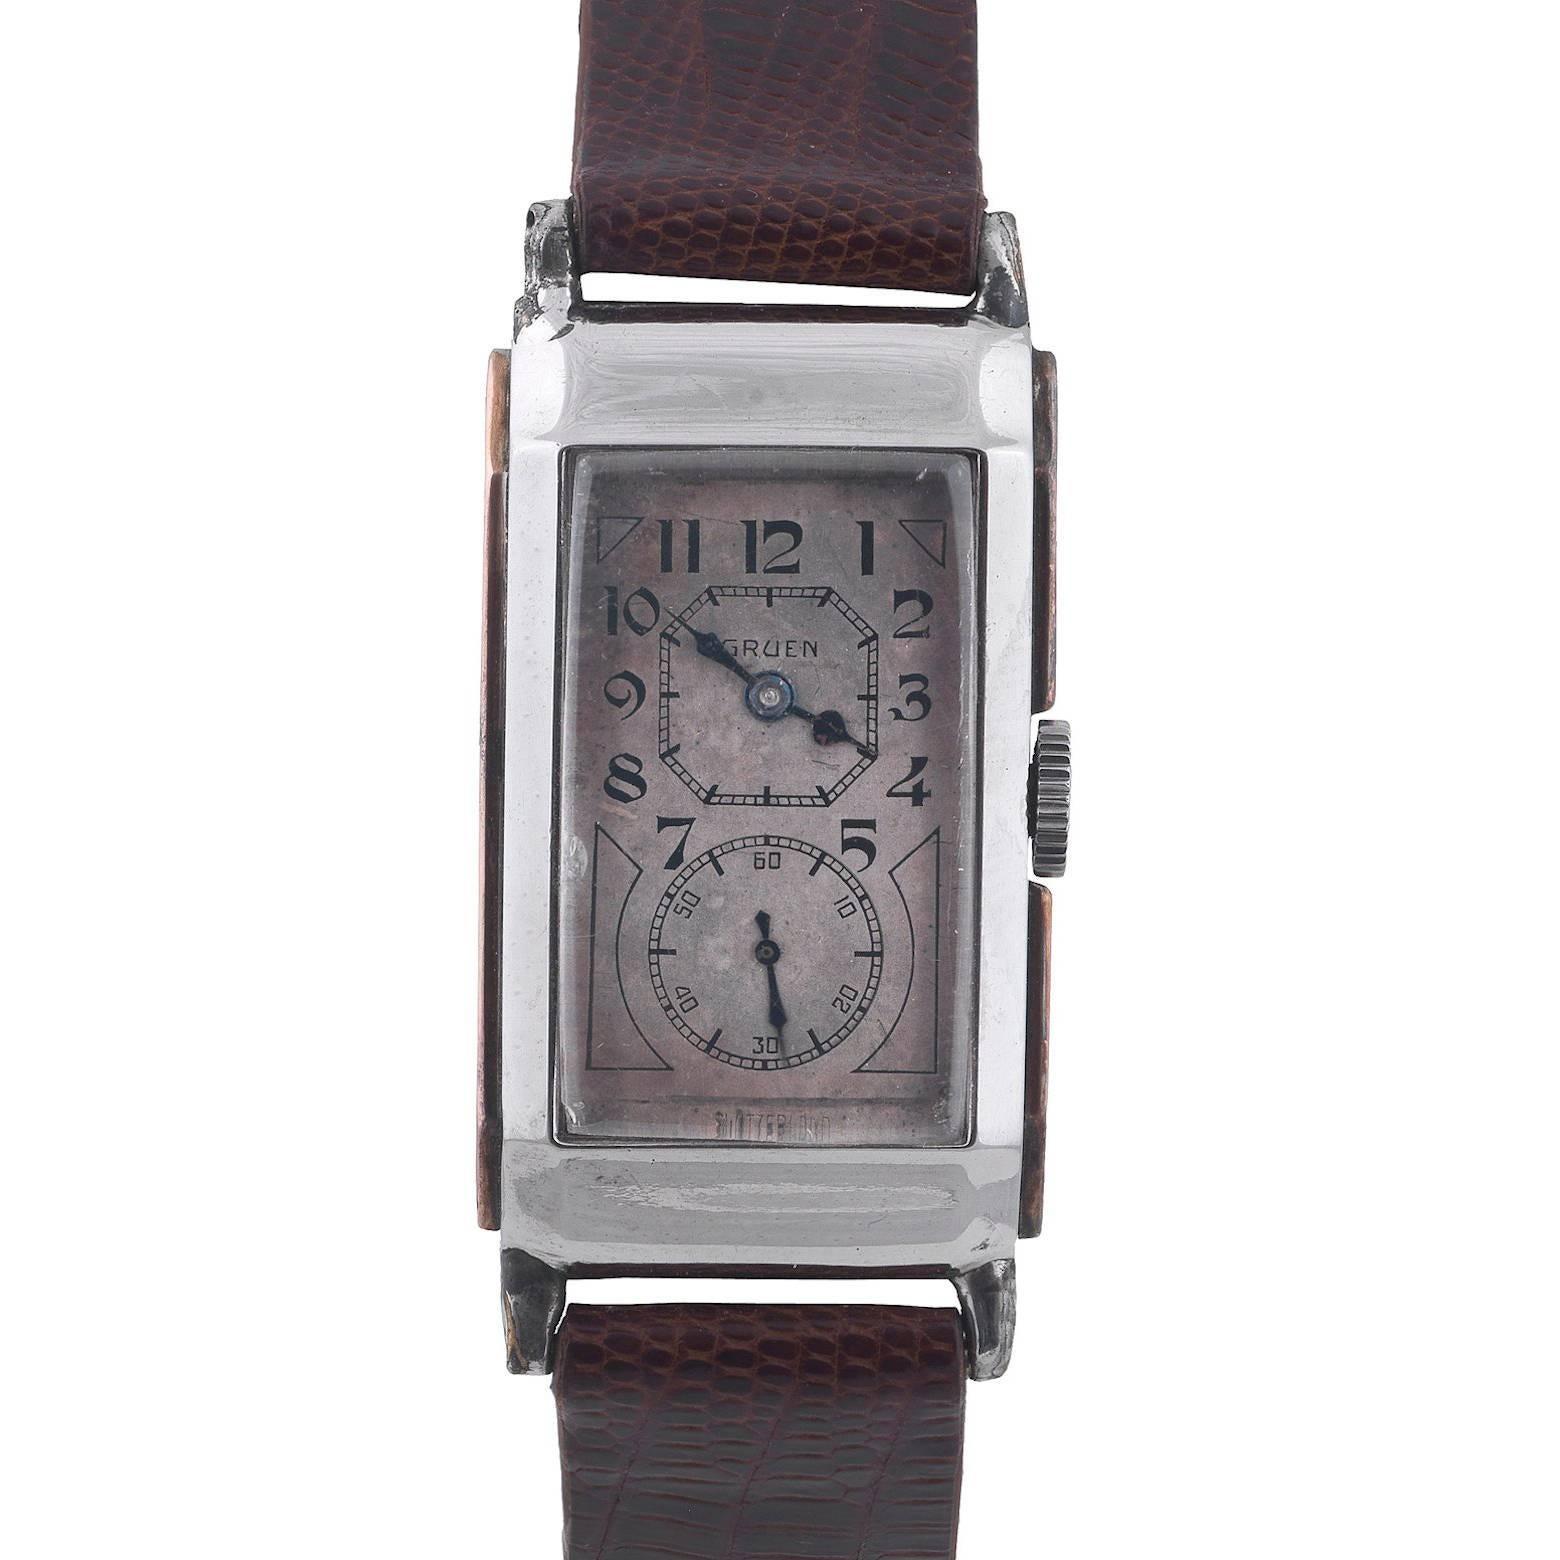 Gruen Gold Stainless Steel Alloy Doctor's Wristwatch, circa 1930s